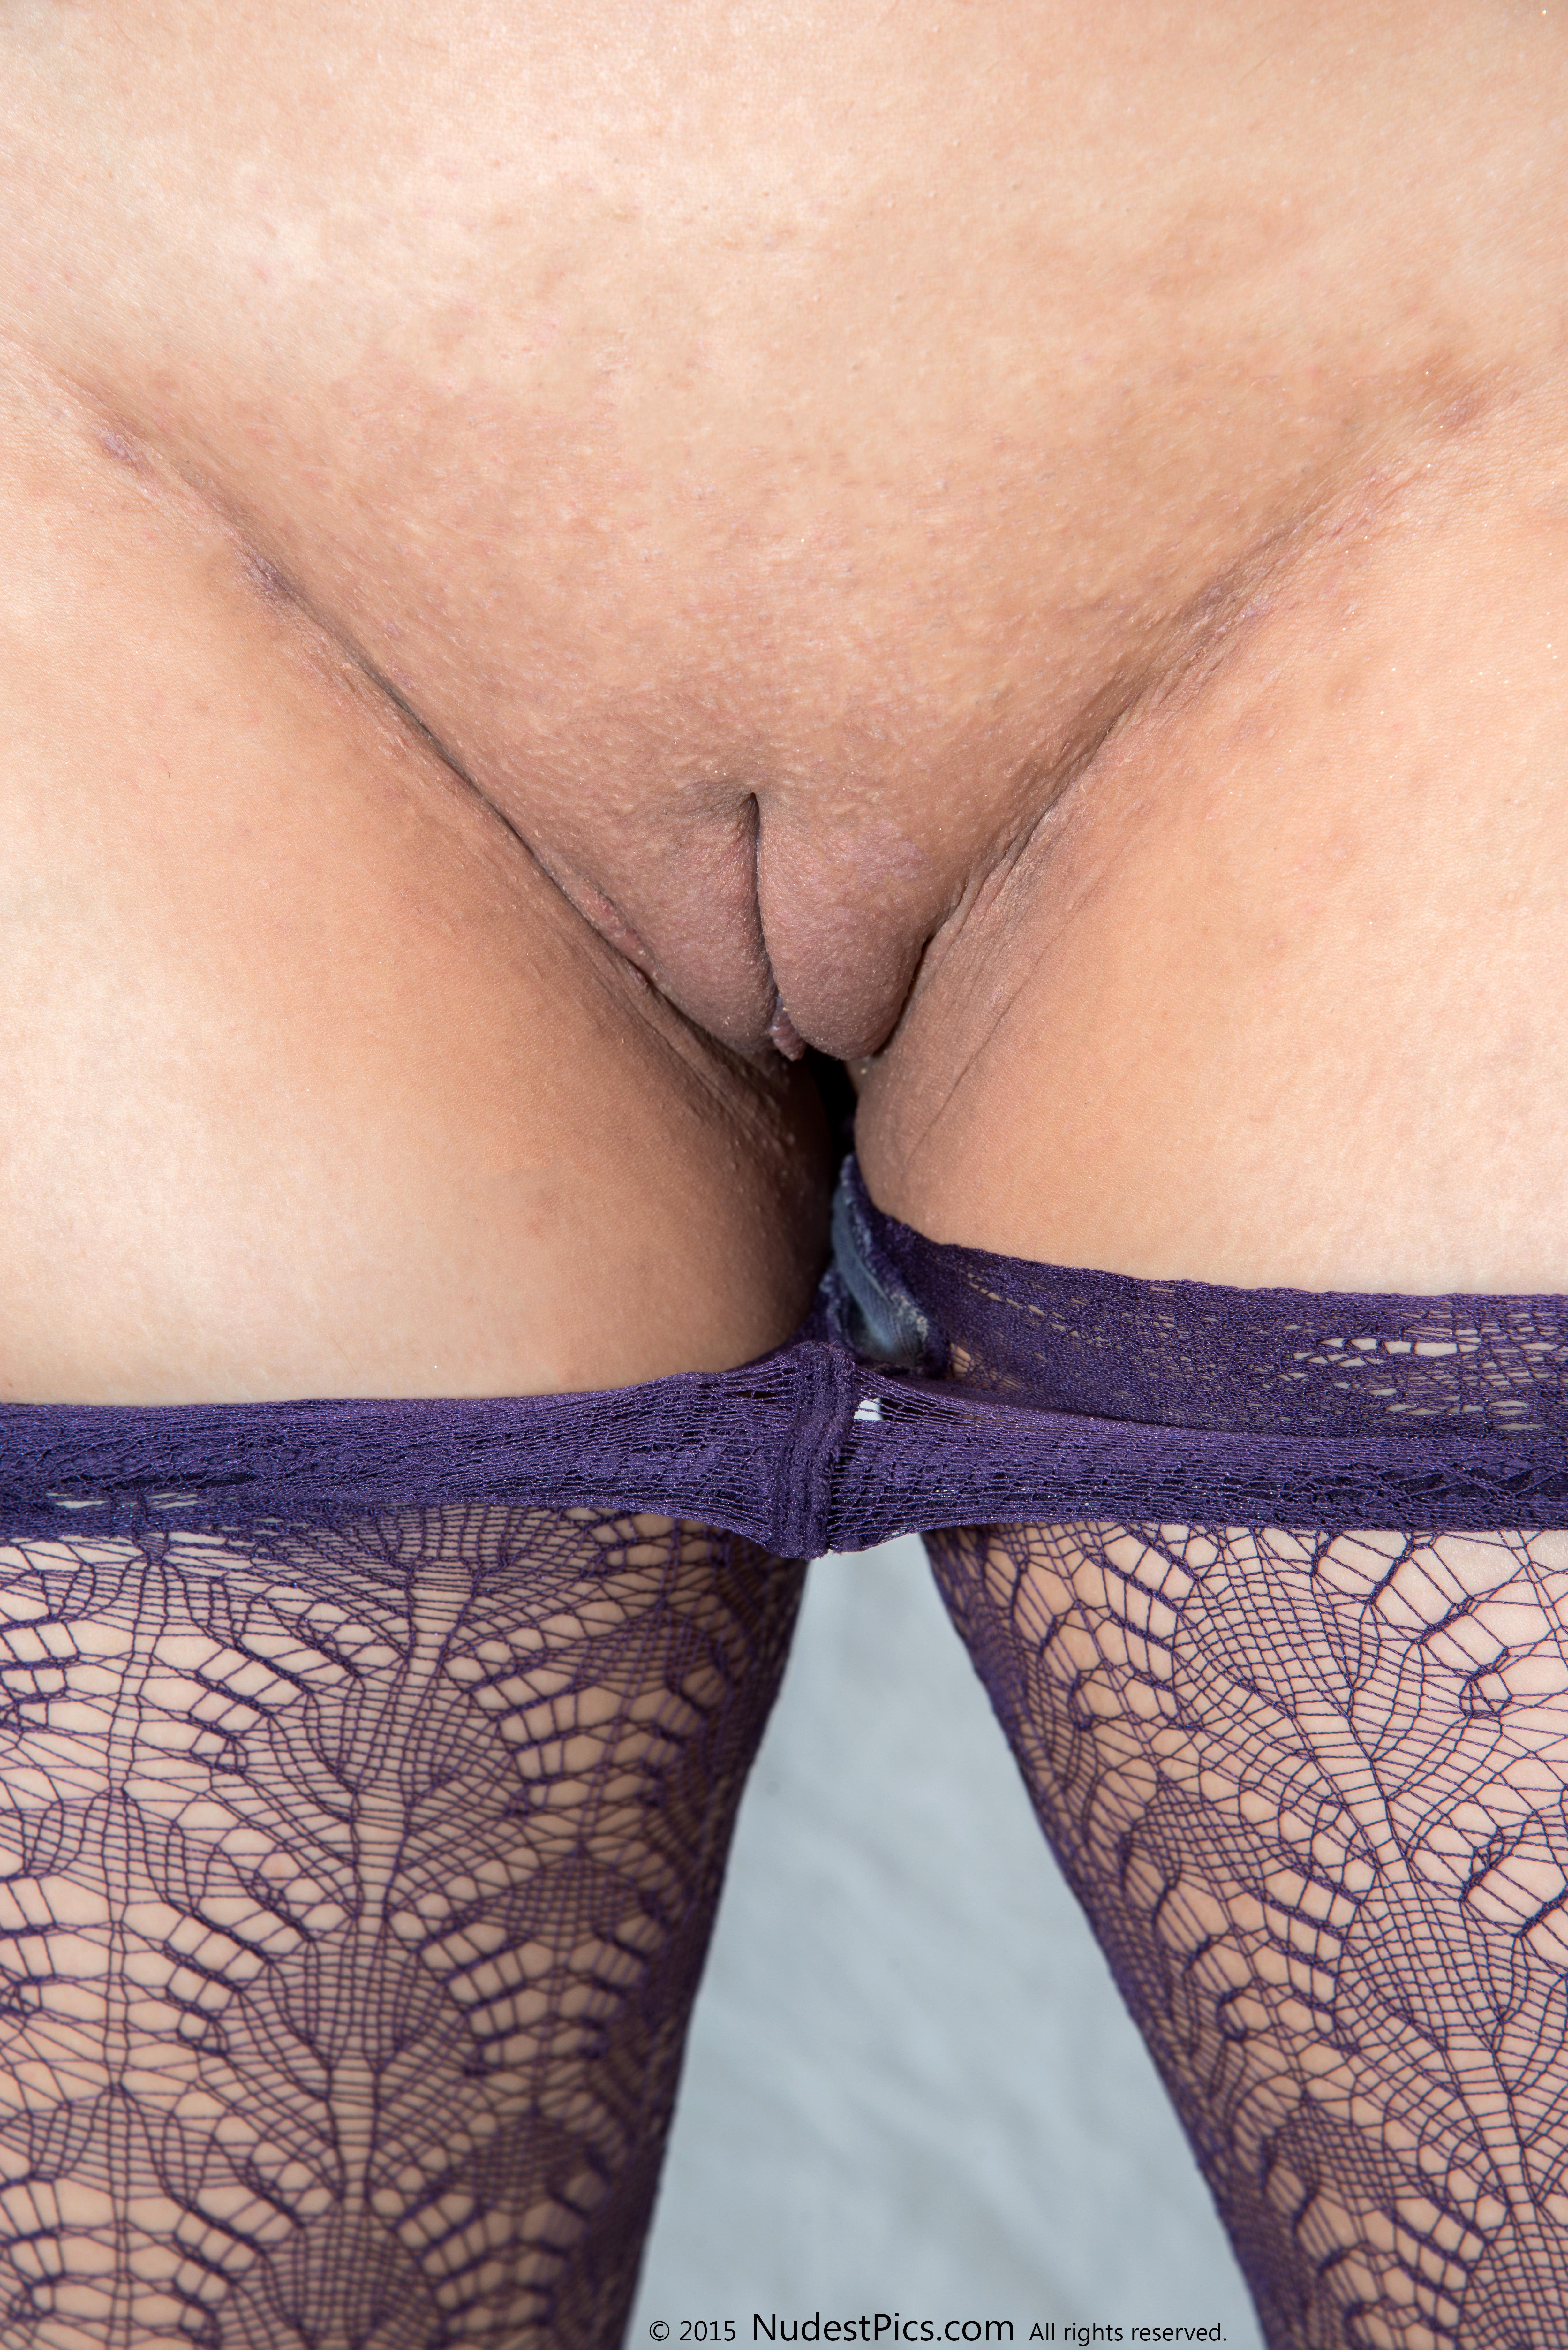 Undressing Tough Skin Shaved Vulva